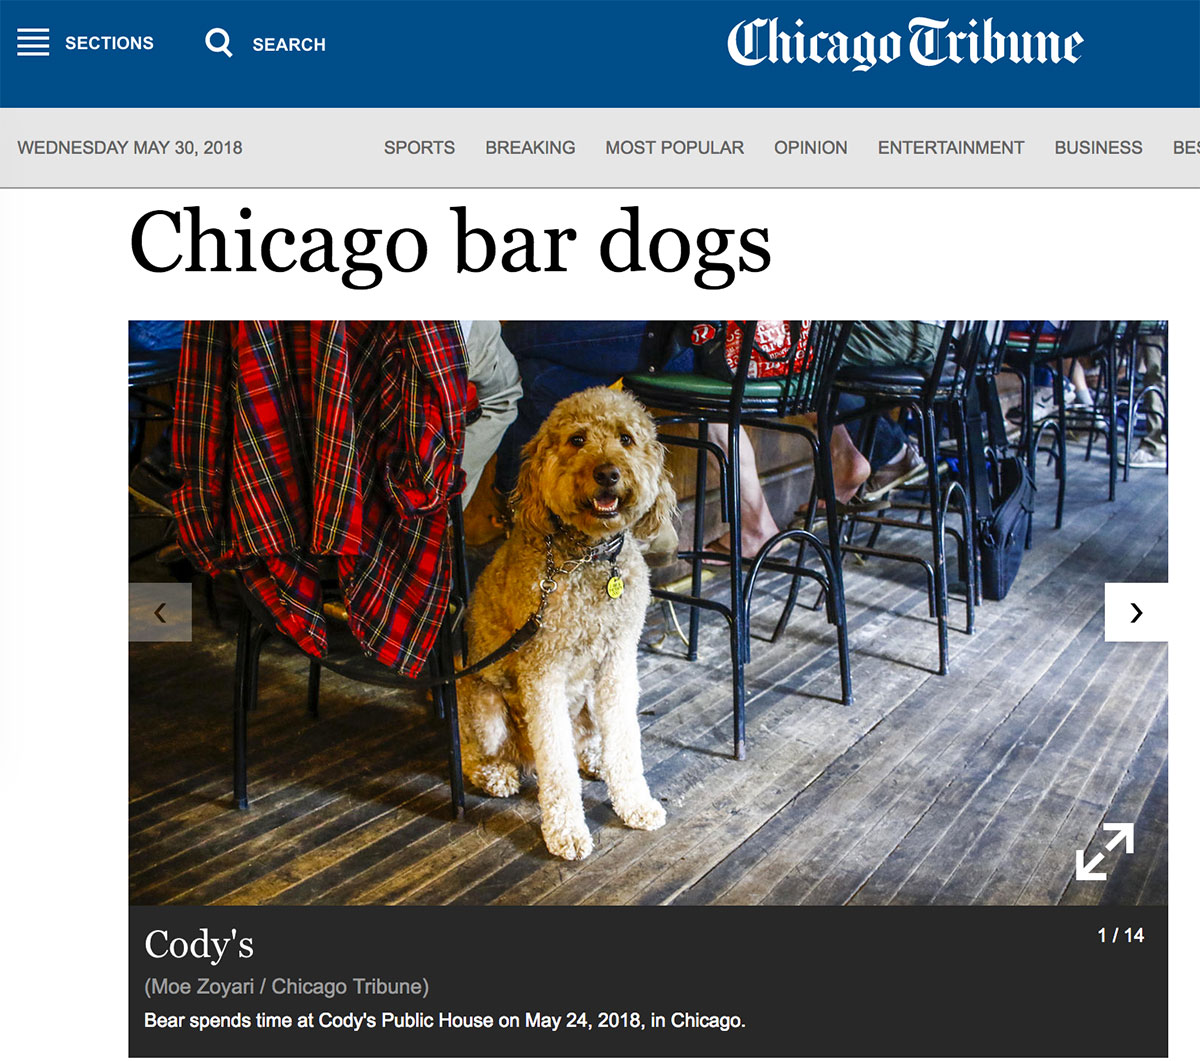 Moe_Zoyari_Chicago_Tribune_04.jpg